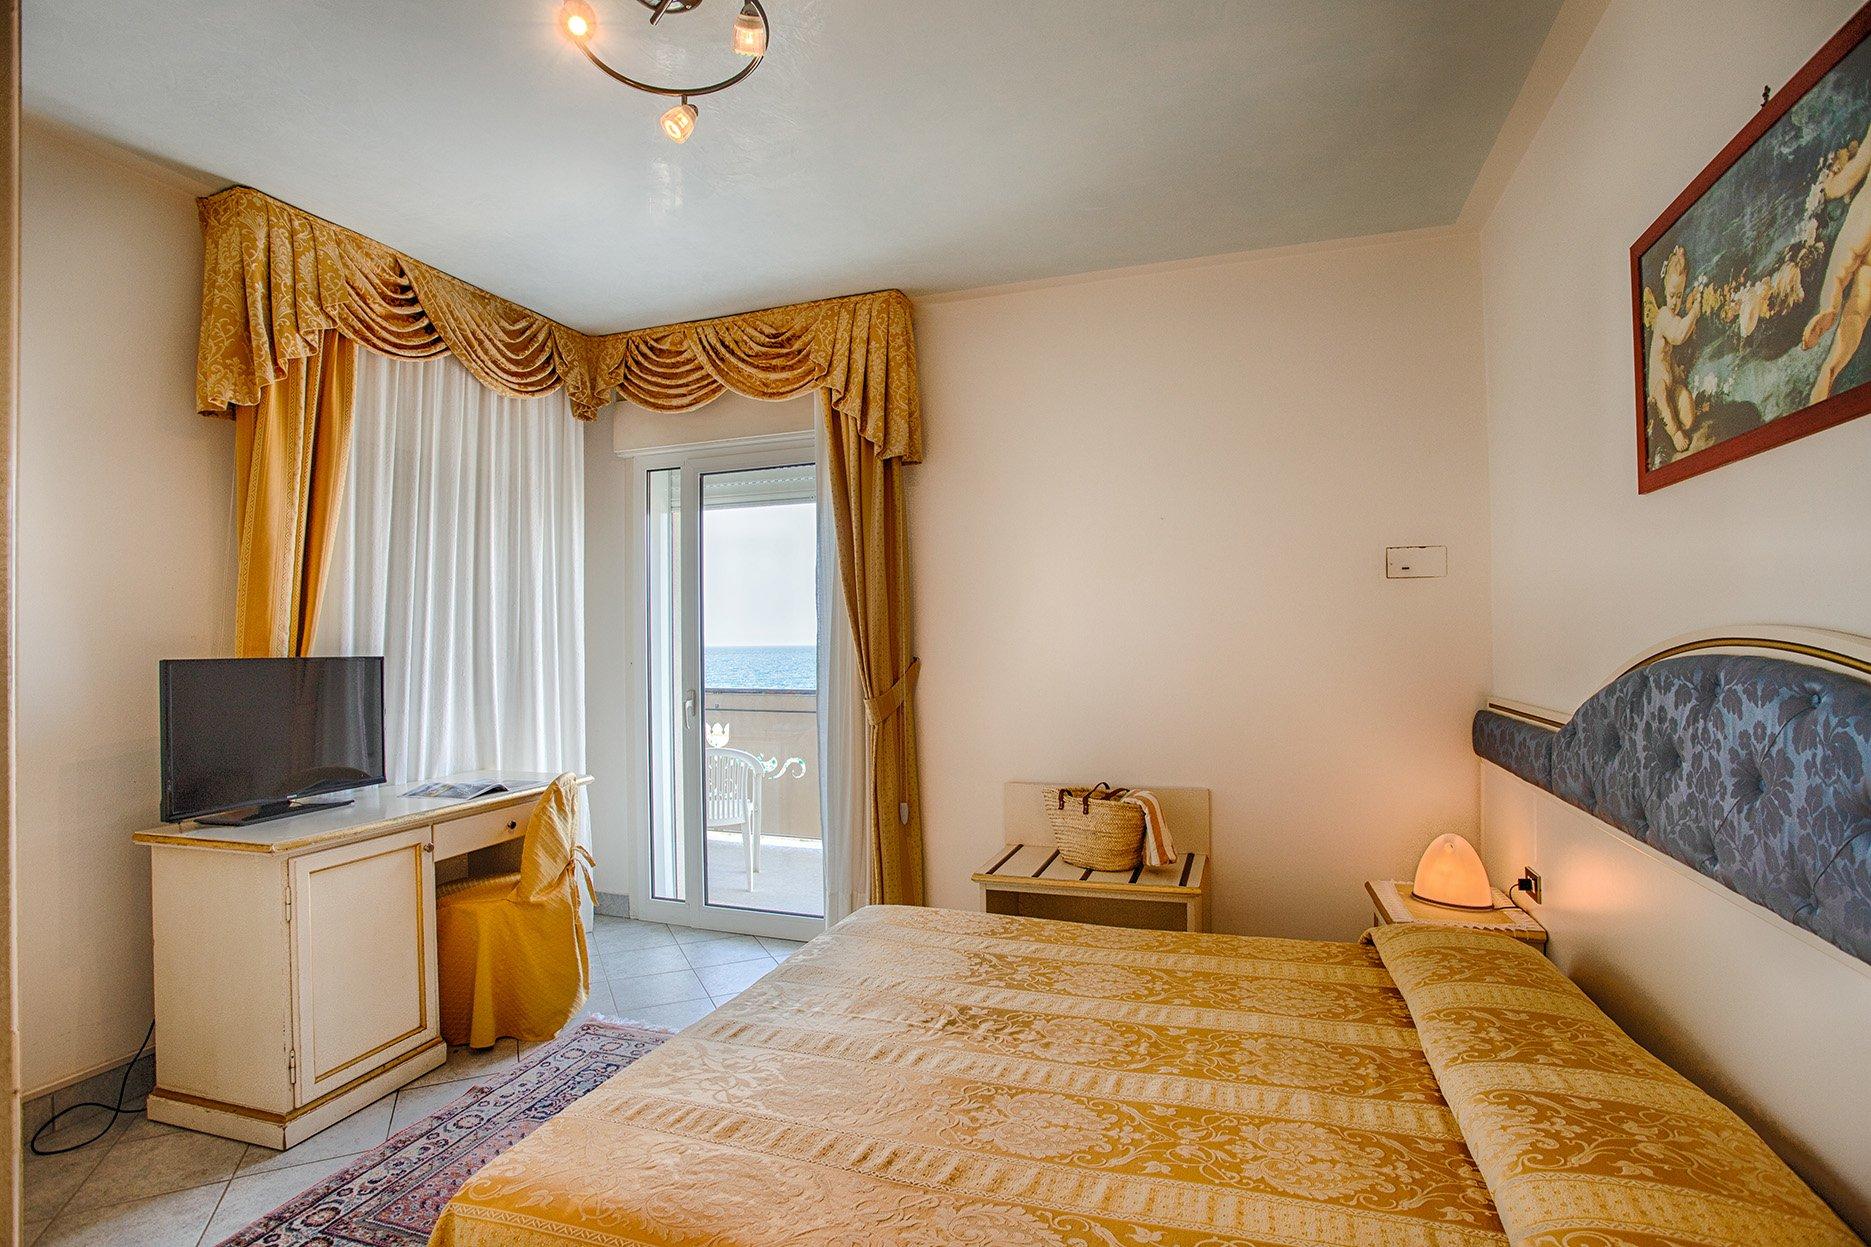 zimmer mit direktem meerblick hotel elpiro. Black Bedroom Furniture Sets. Home Design Ideas